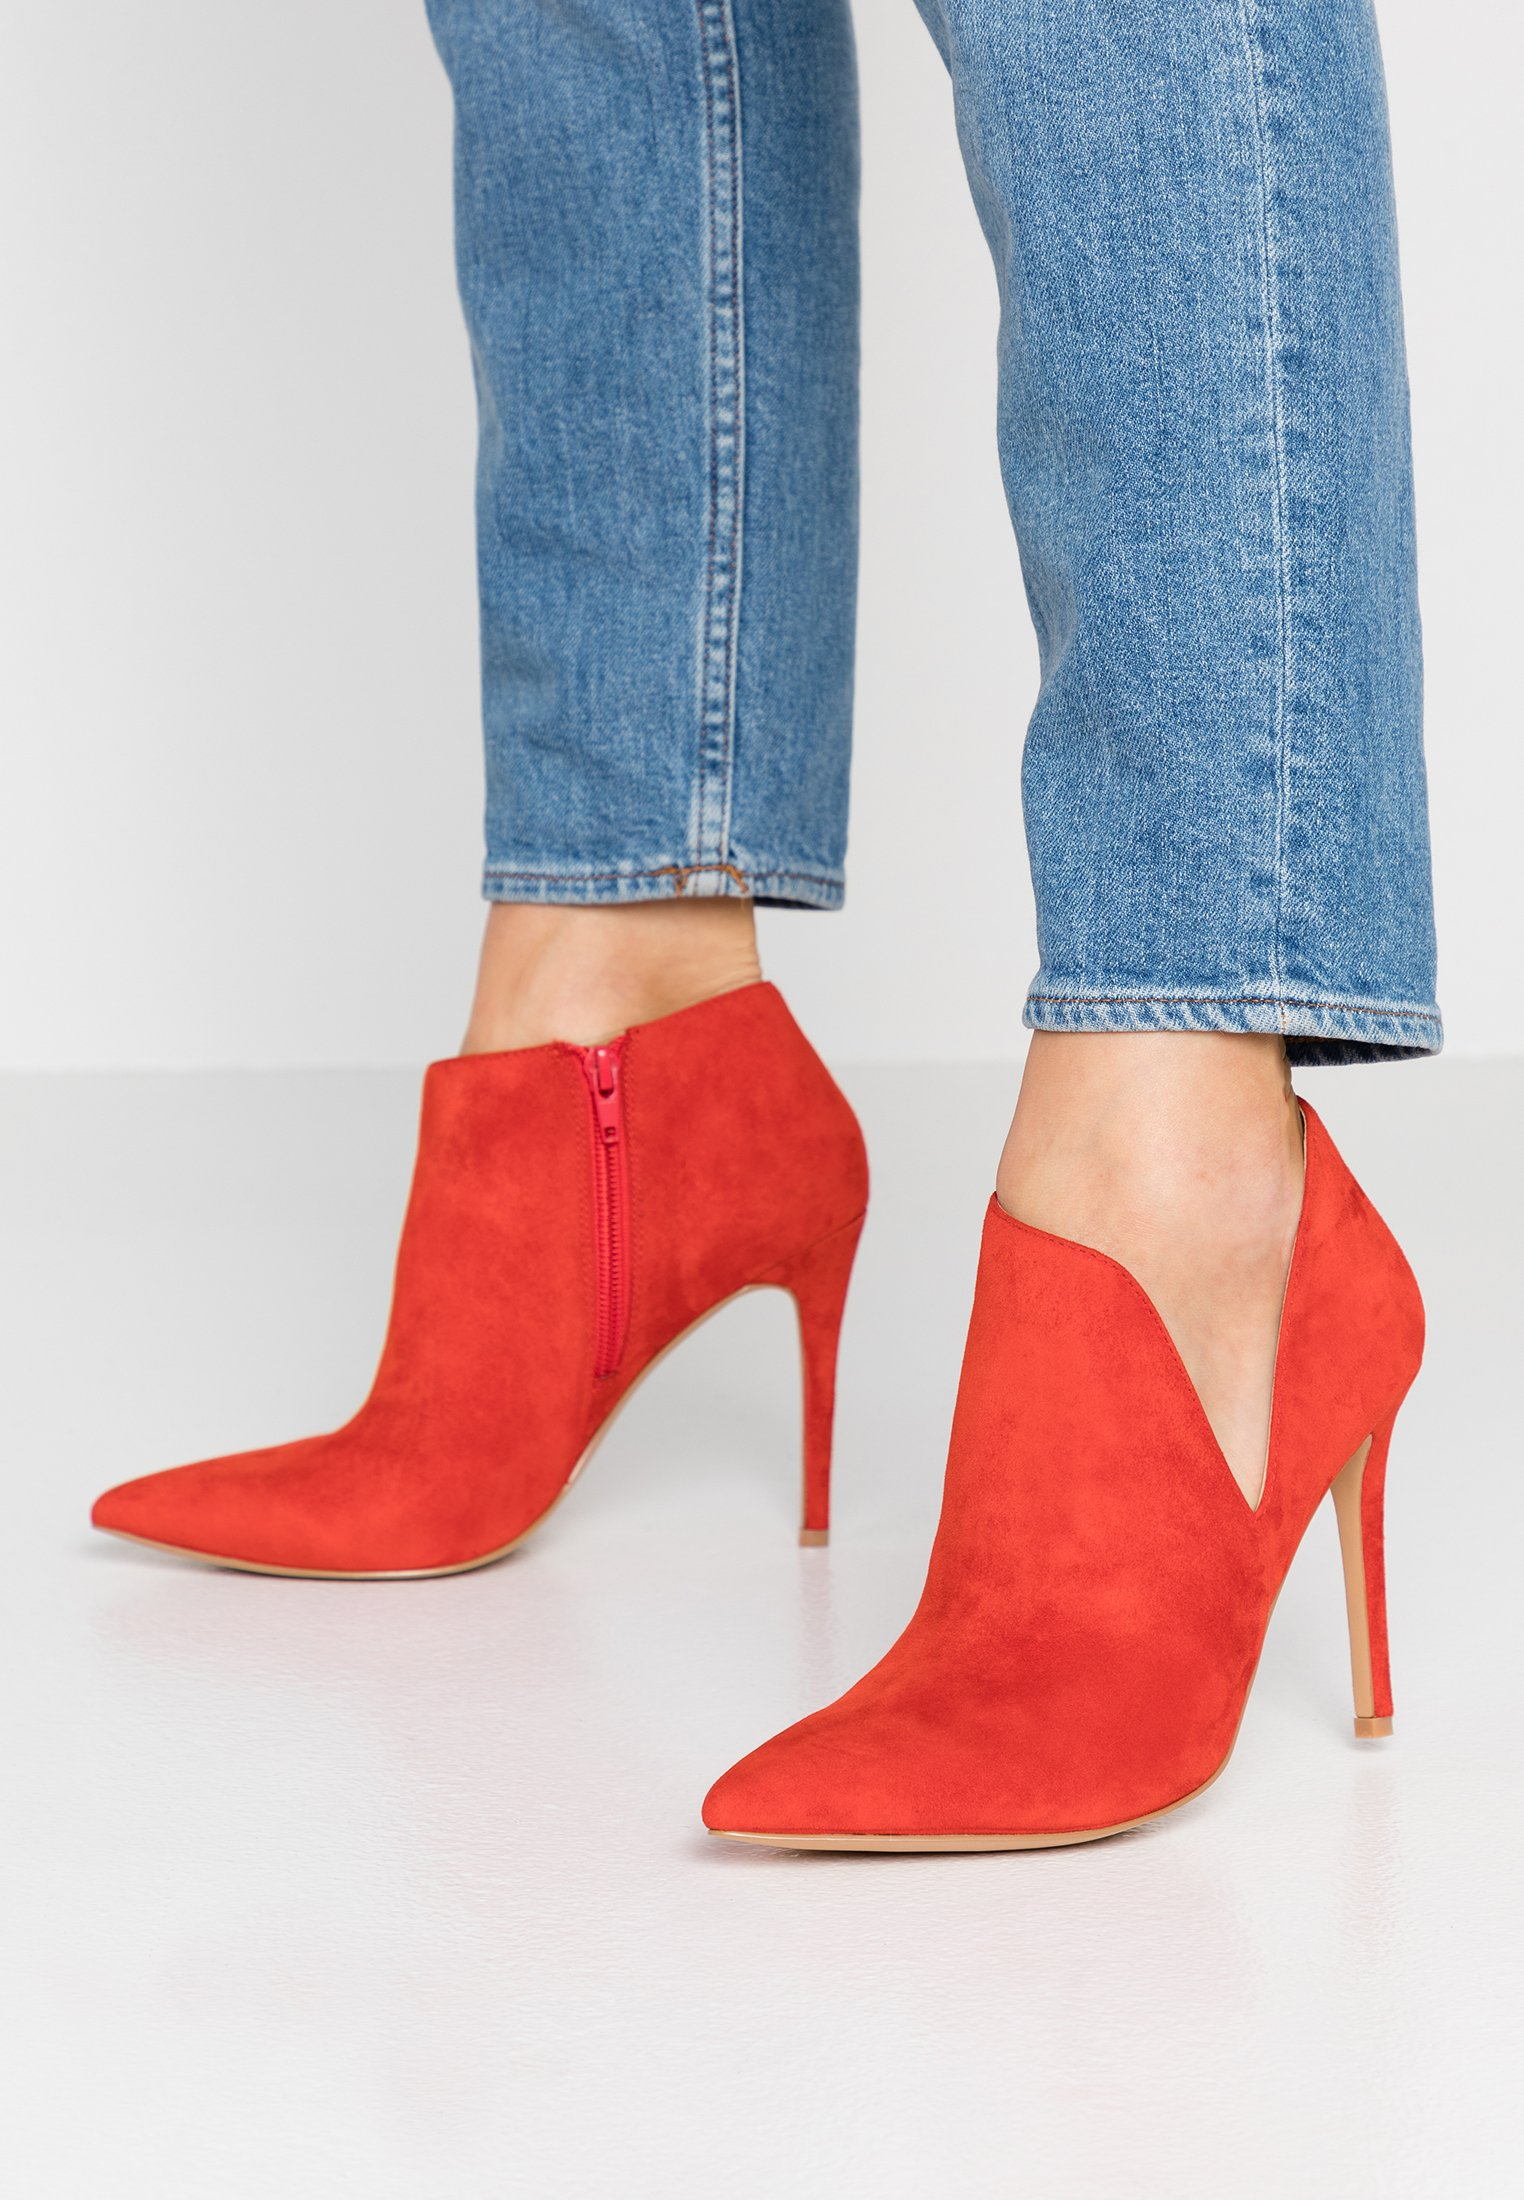 Prescripción Torbellino Renacimiento  Steve Madden ARIZA - High heeled ankle boots - red/red - Zalando.co.uk